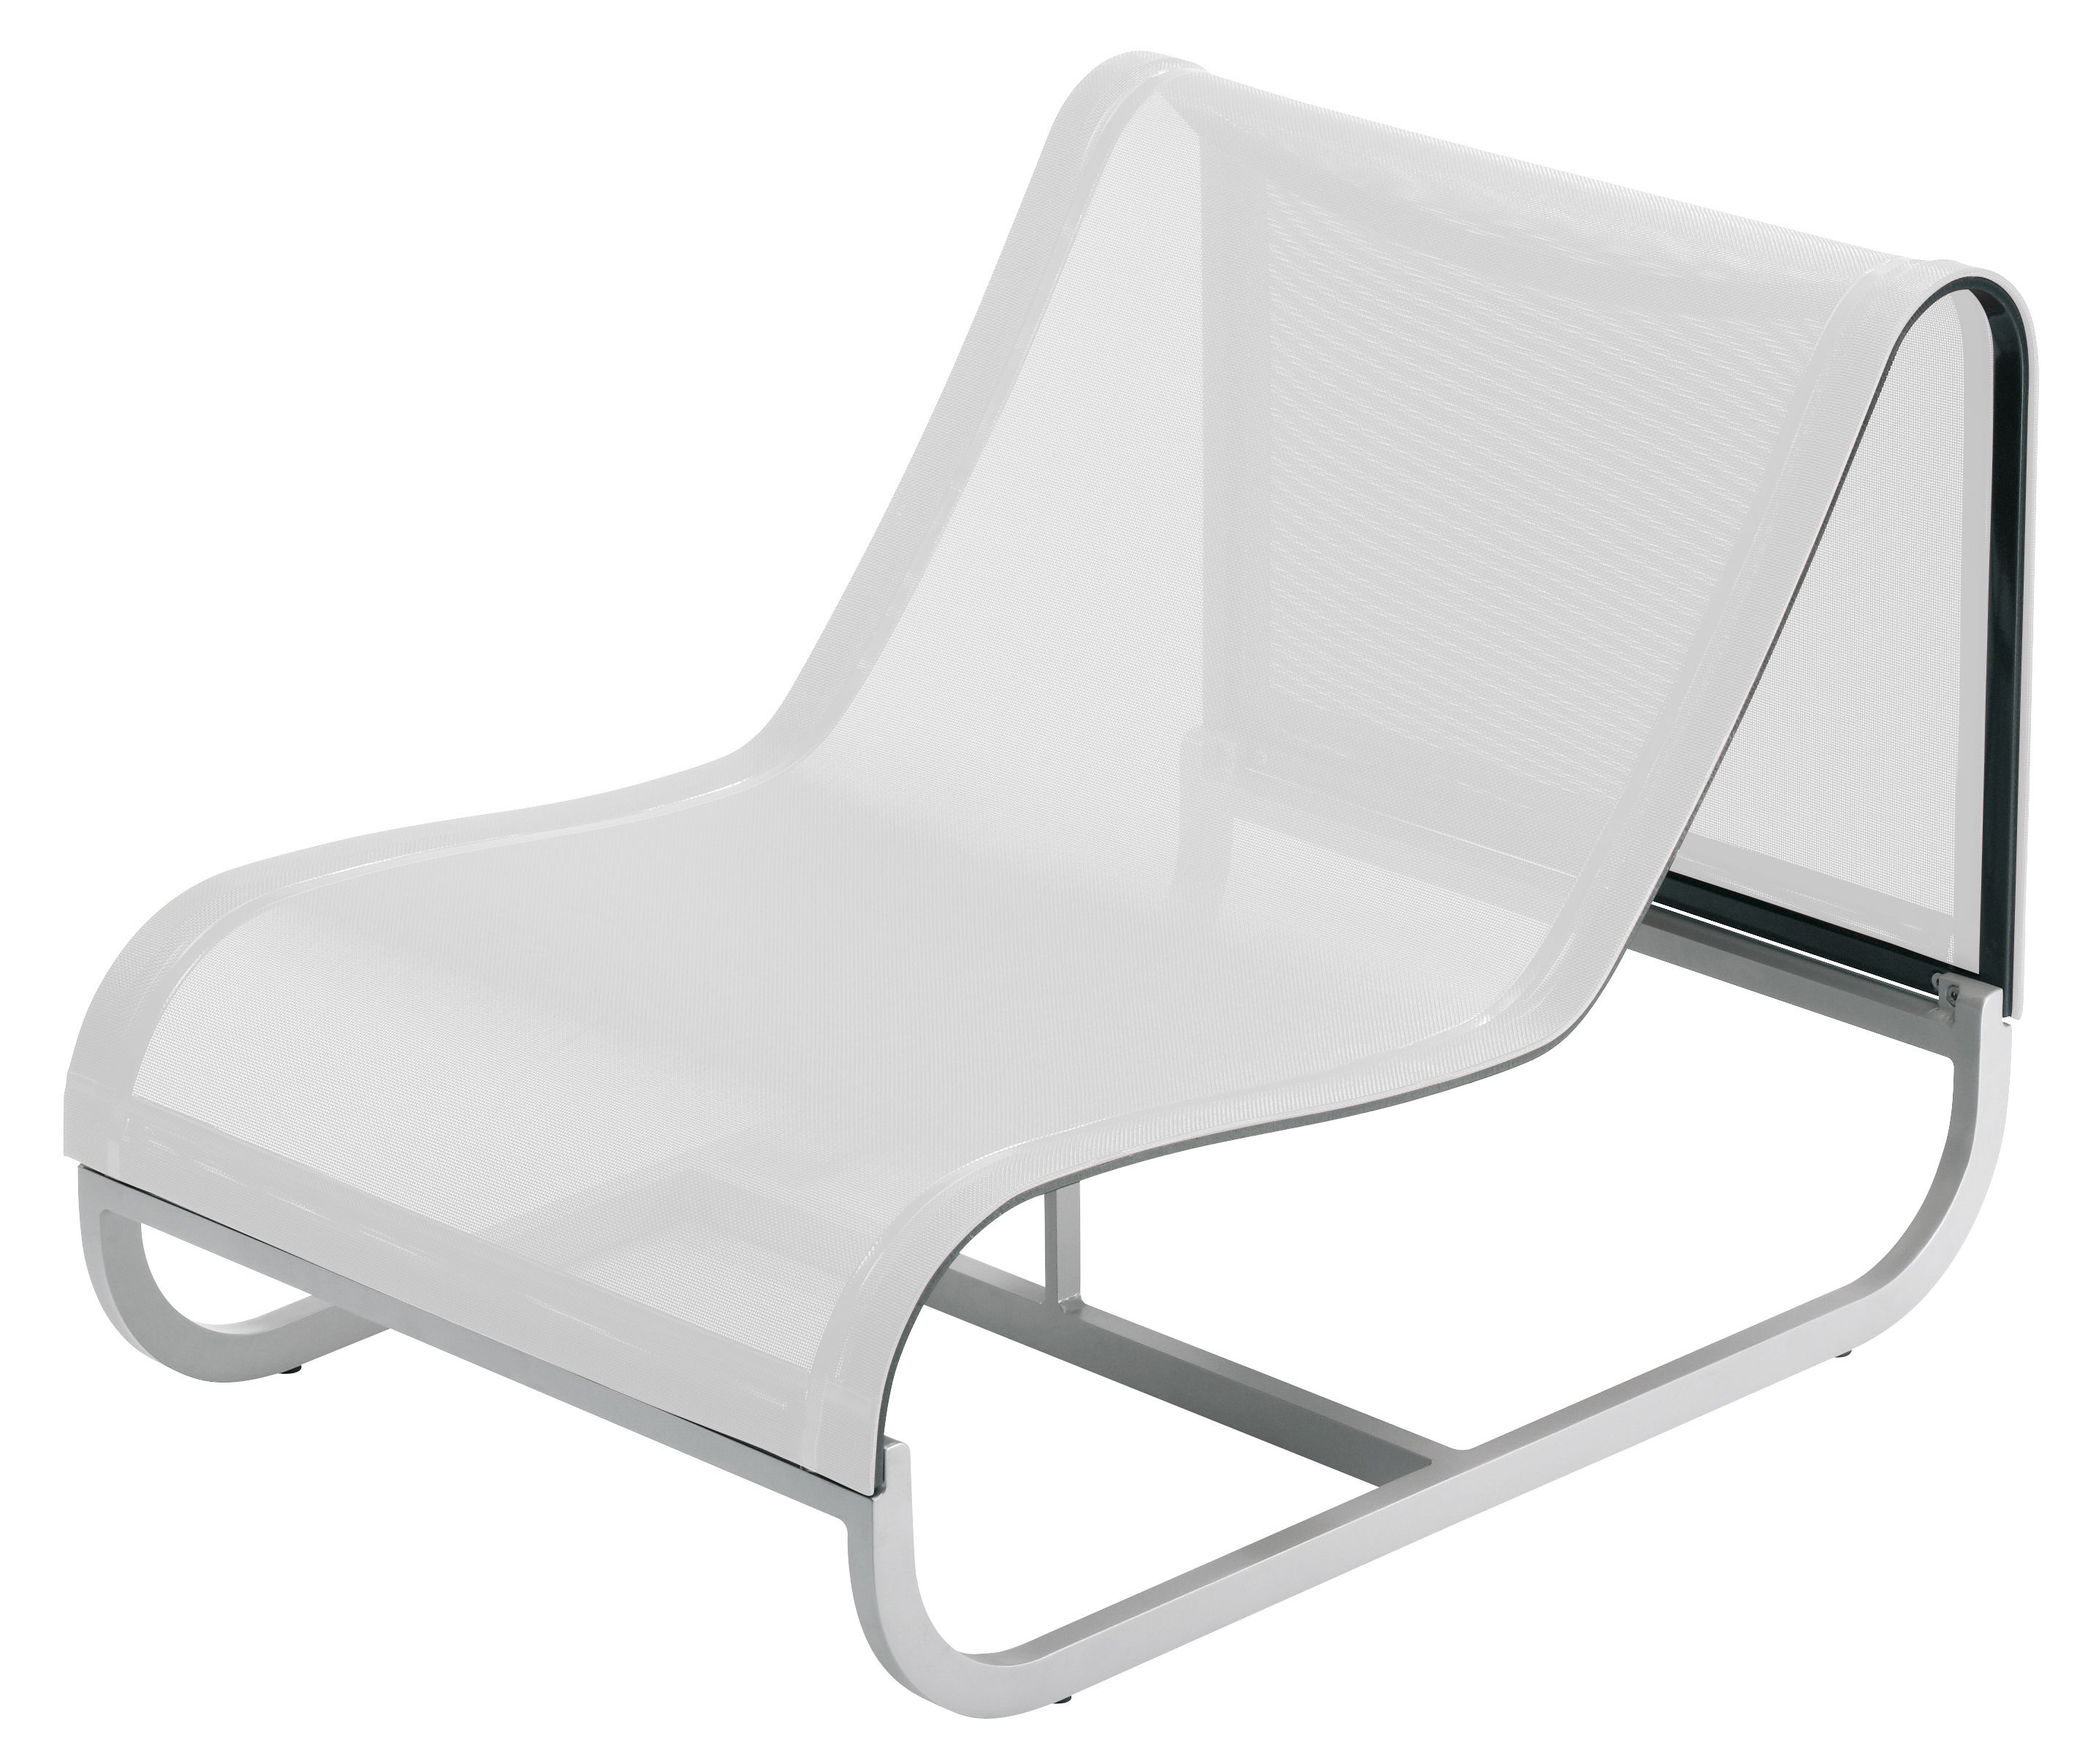 Outdoor - Gartensessel - Tandem Lounge Sessel mittleres Modul - EGO Paris - Bezug weiß - Batyline® Bespannung, lackiertes Aluminium